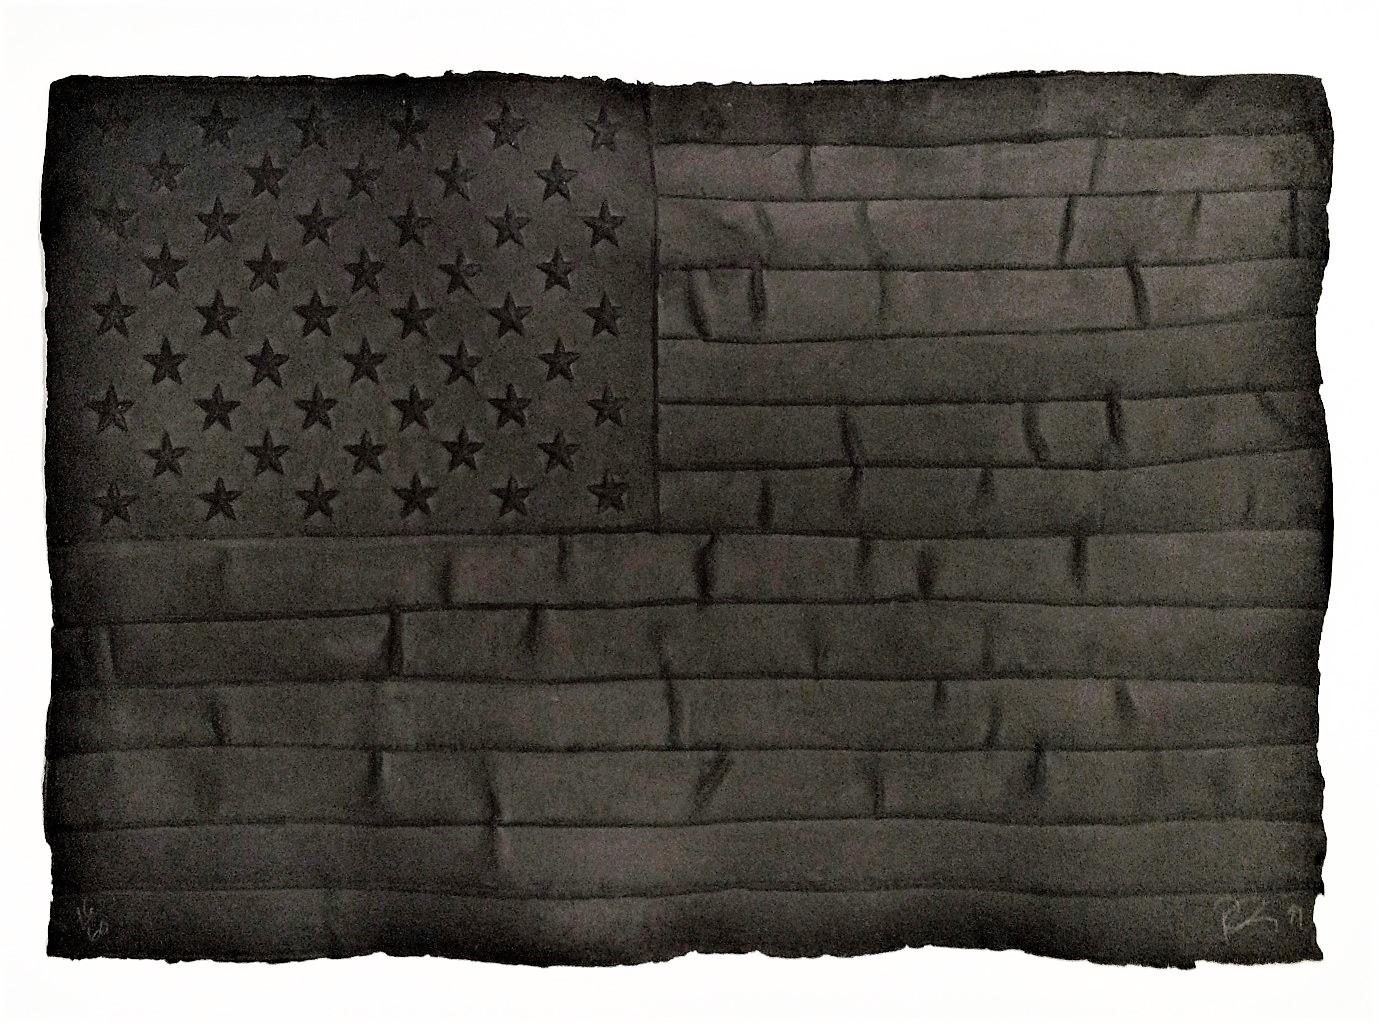 Black Flag by Robert Longo